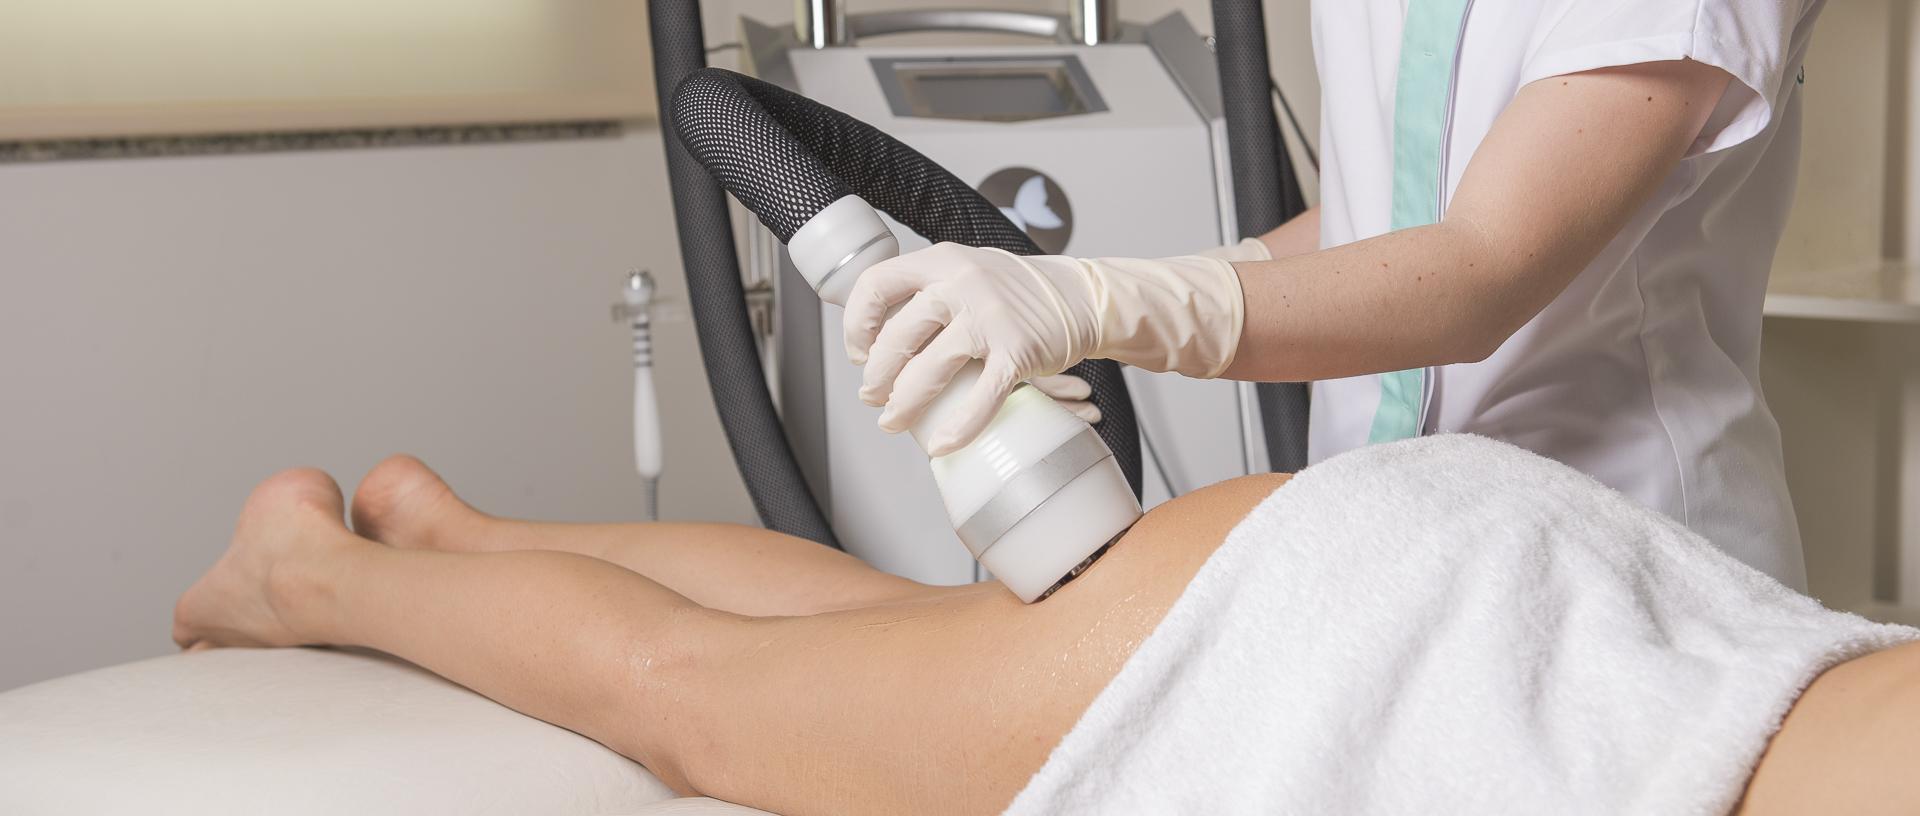 Tratamento de Corpo: Crioradiofrequência